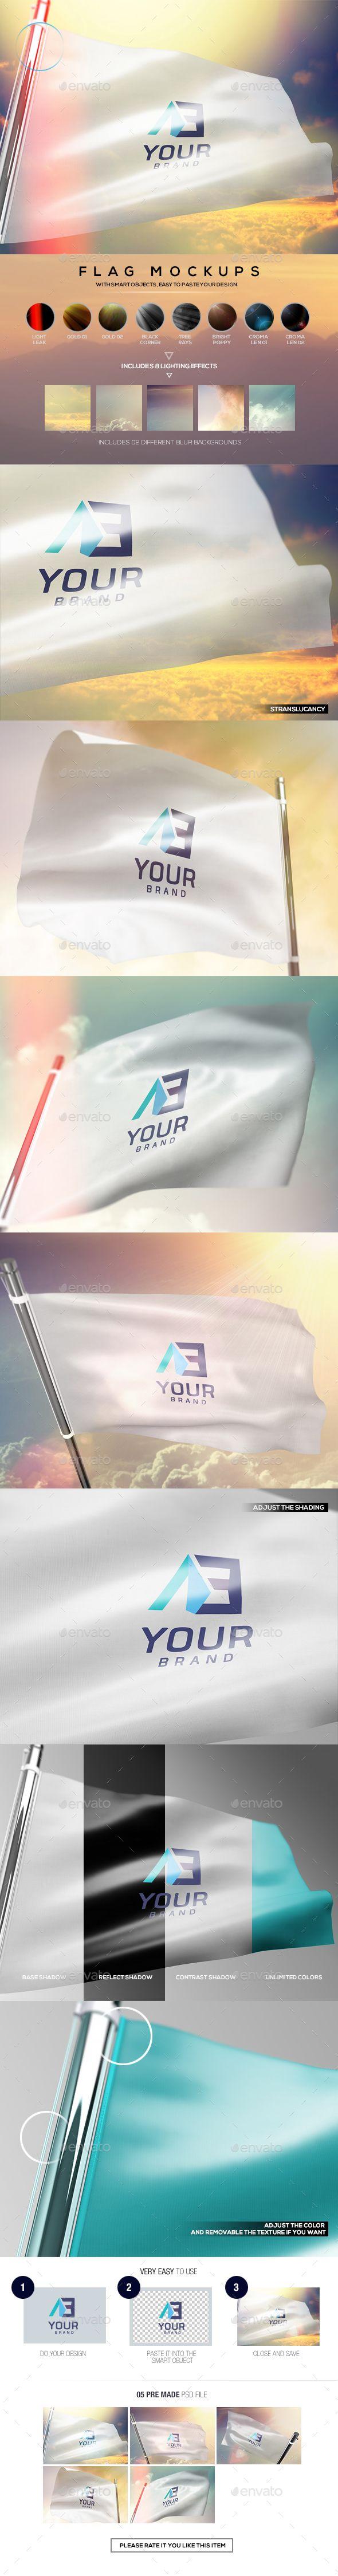 best 25 flags ideas on pinterest